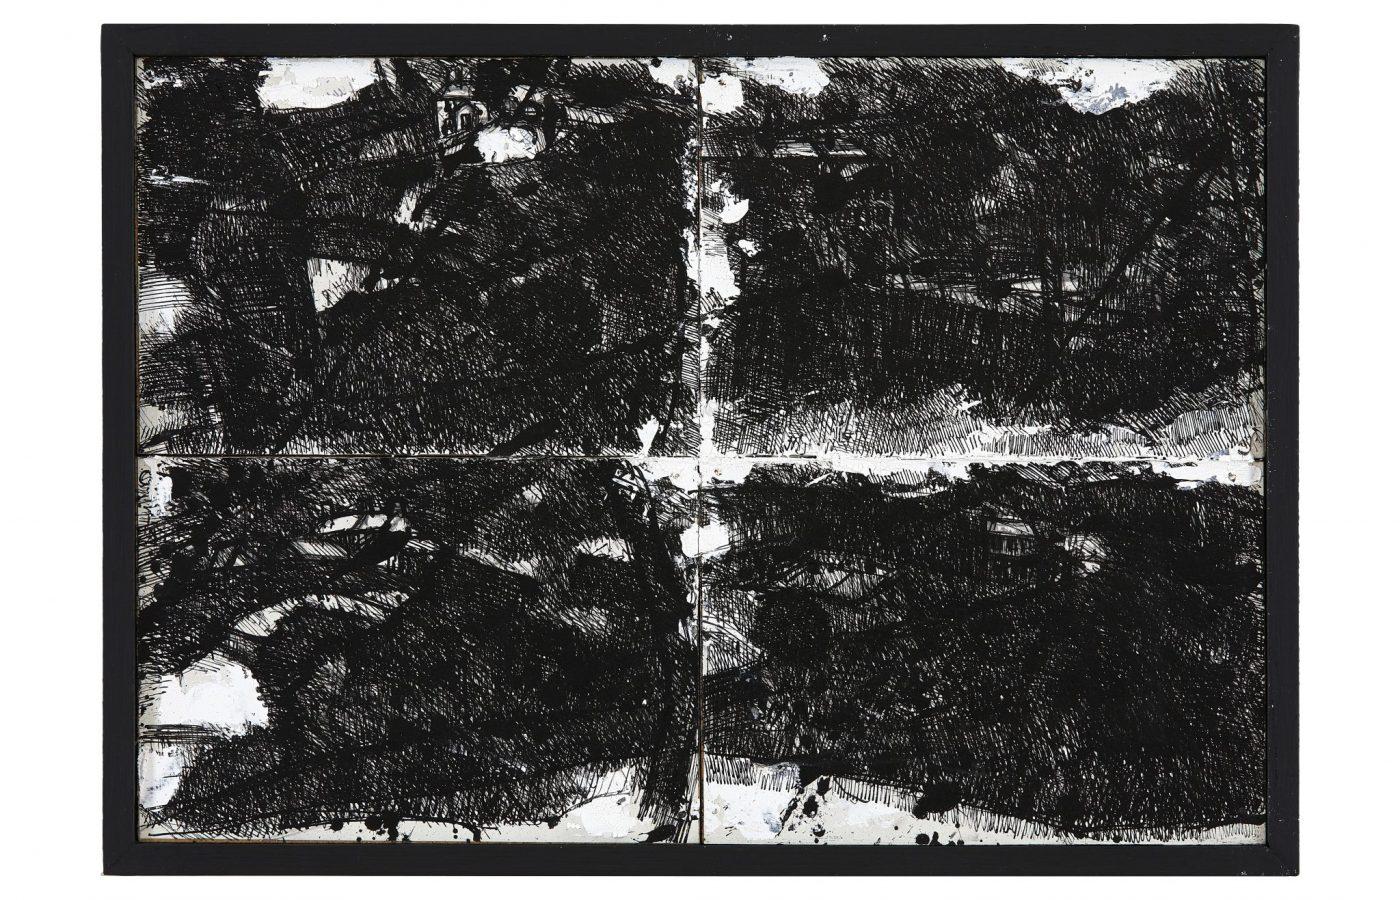 FXF18-53 John Virtue Landscape No 112 1990-91